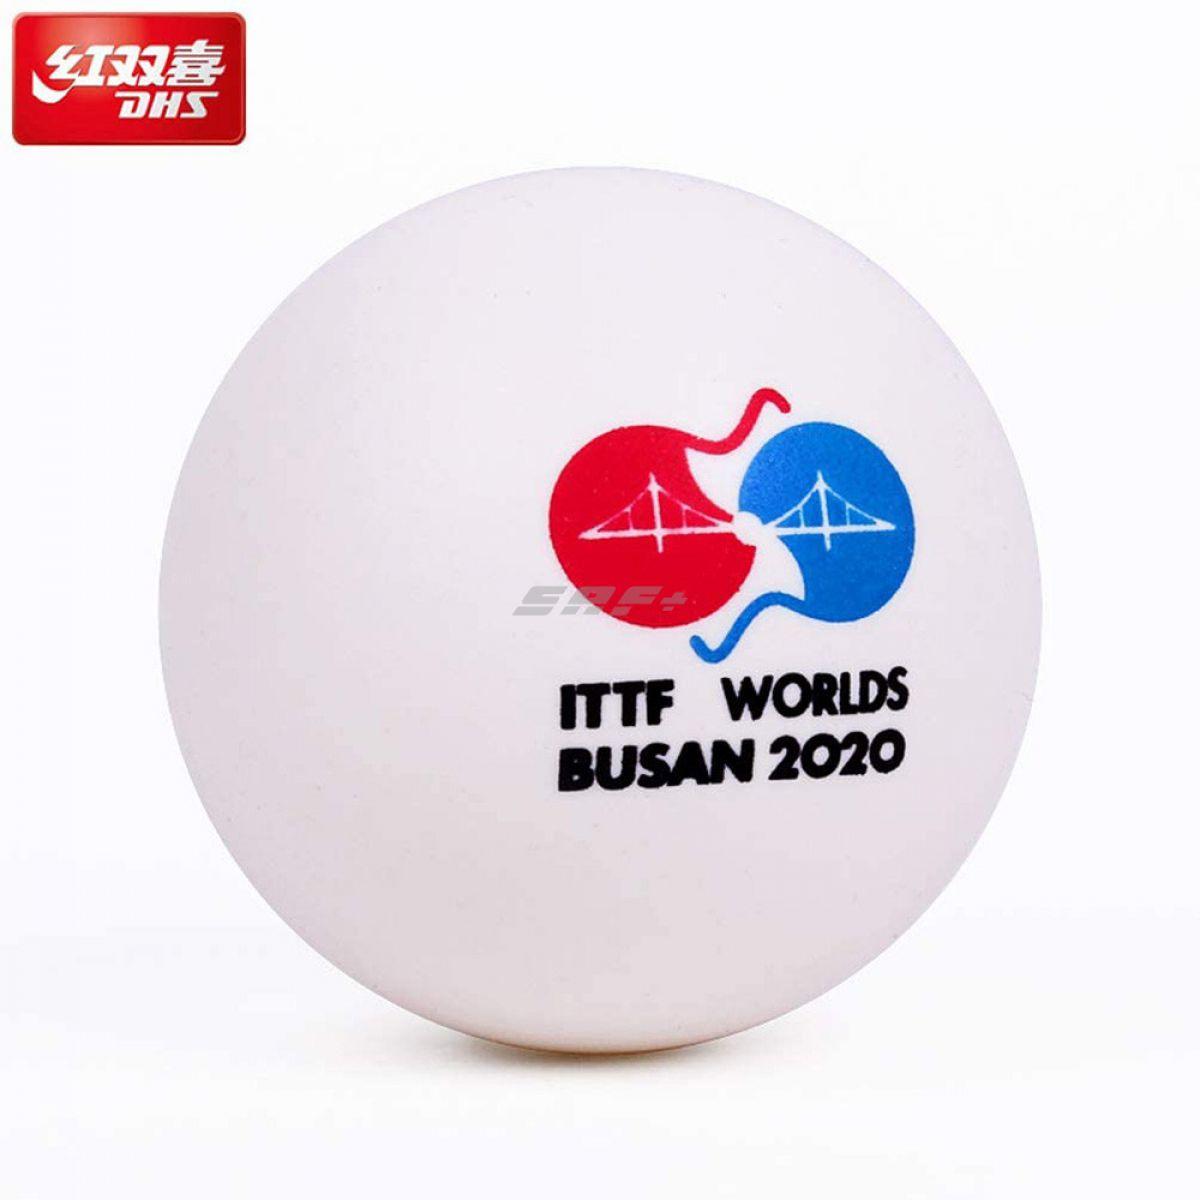 Мяч для наст. тенниса DHS 3*** Busan, арт. DJ40W, диам.40+, пластик, ITTF Appr., упак. 6 шт, белый